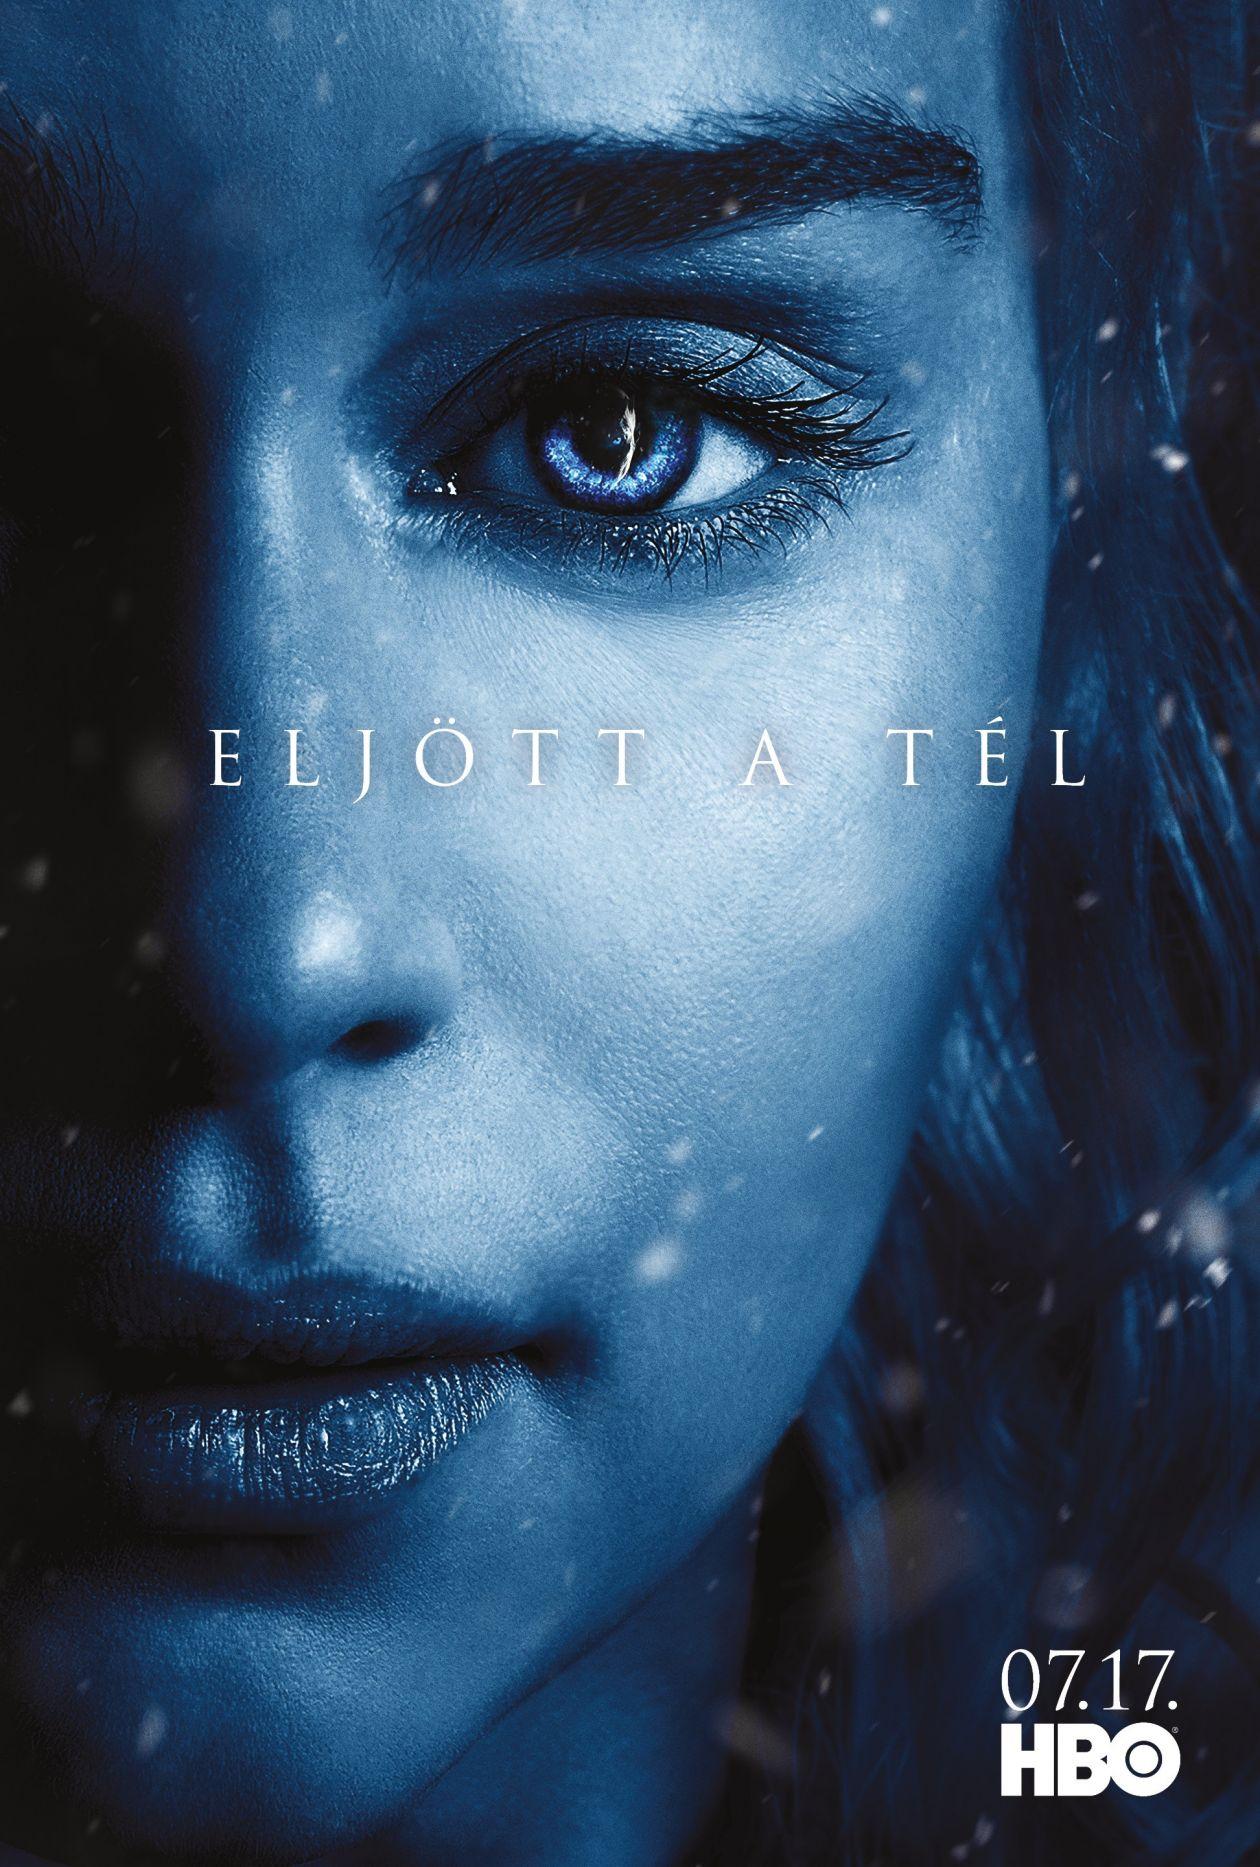 Emilia Clarke actress   Queen Daenerys Targaryen / Game of Thrones / Movie Series Season 7 Poster Affiche série Saison 7 2017